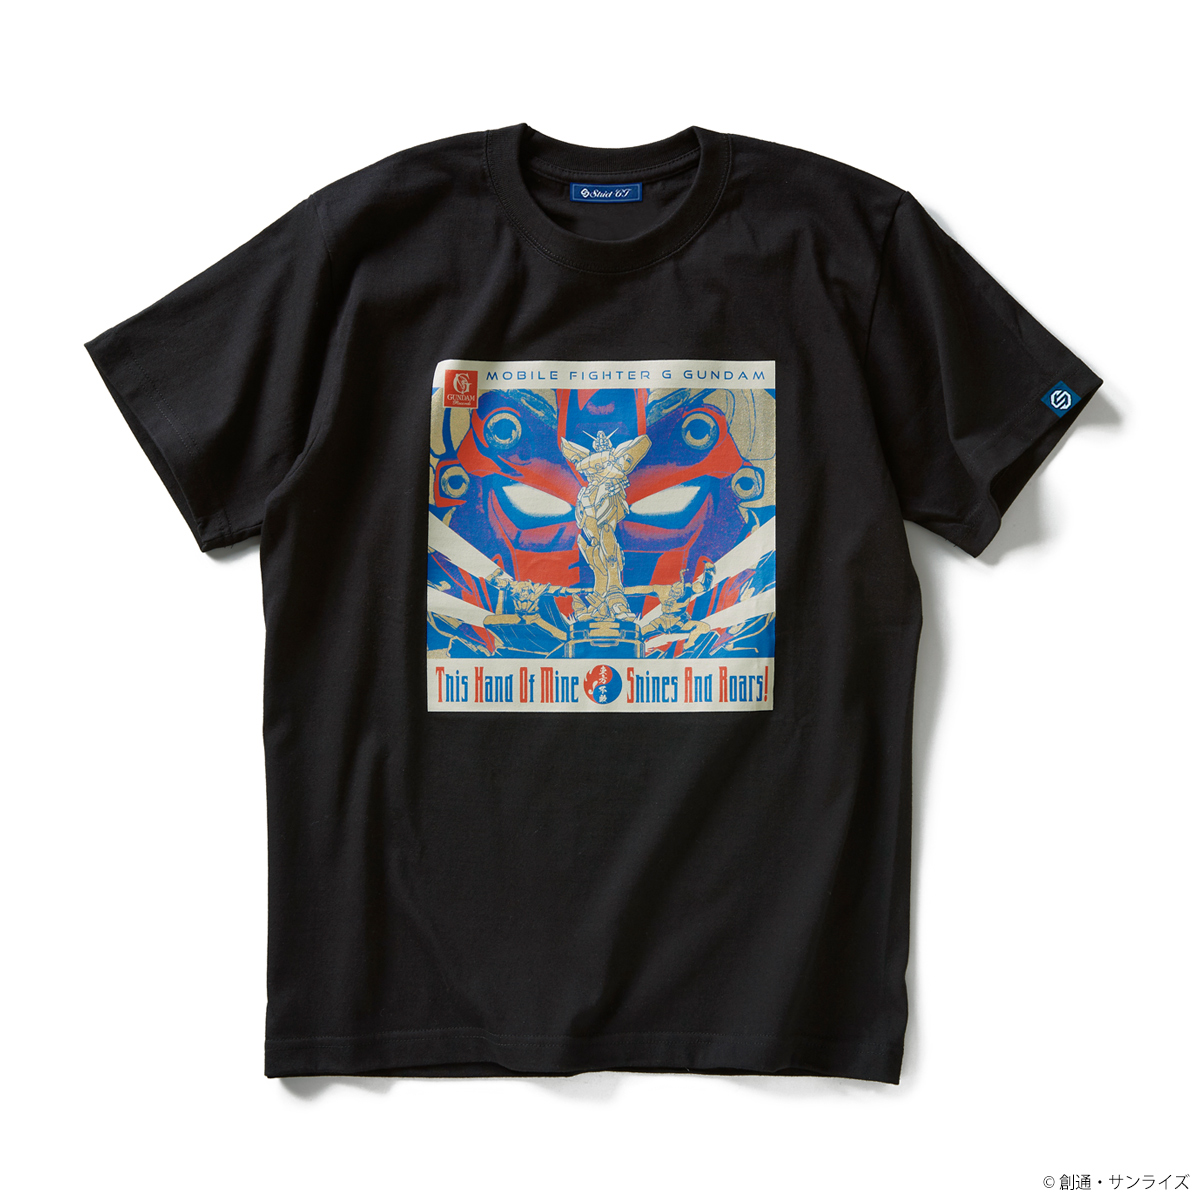 STRICT-G GUNDAM RECORDS 『機動武闘伝Gガンダム』Tシャツ